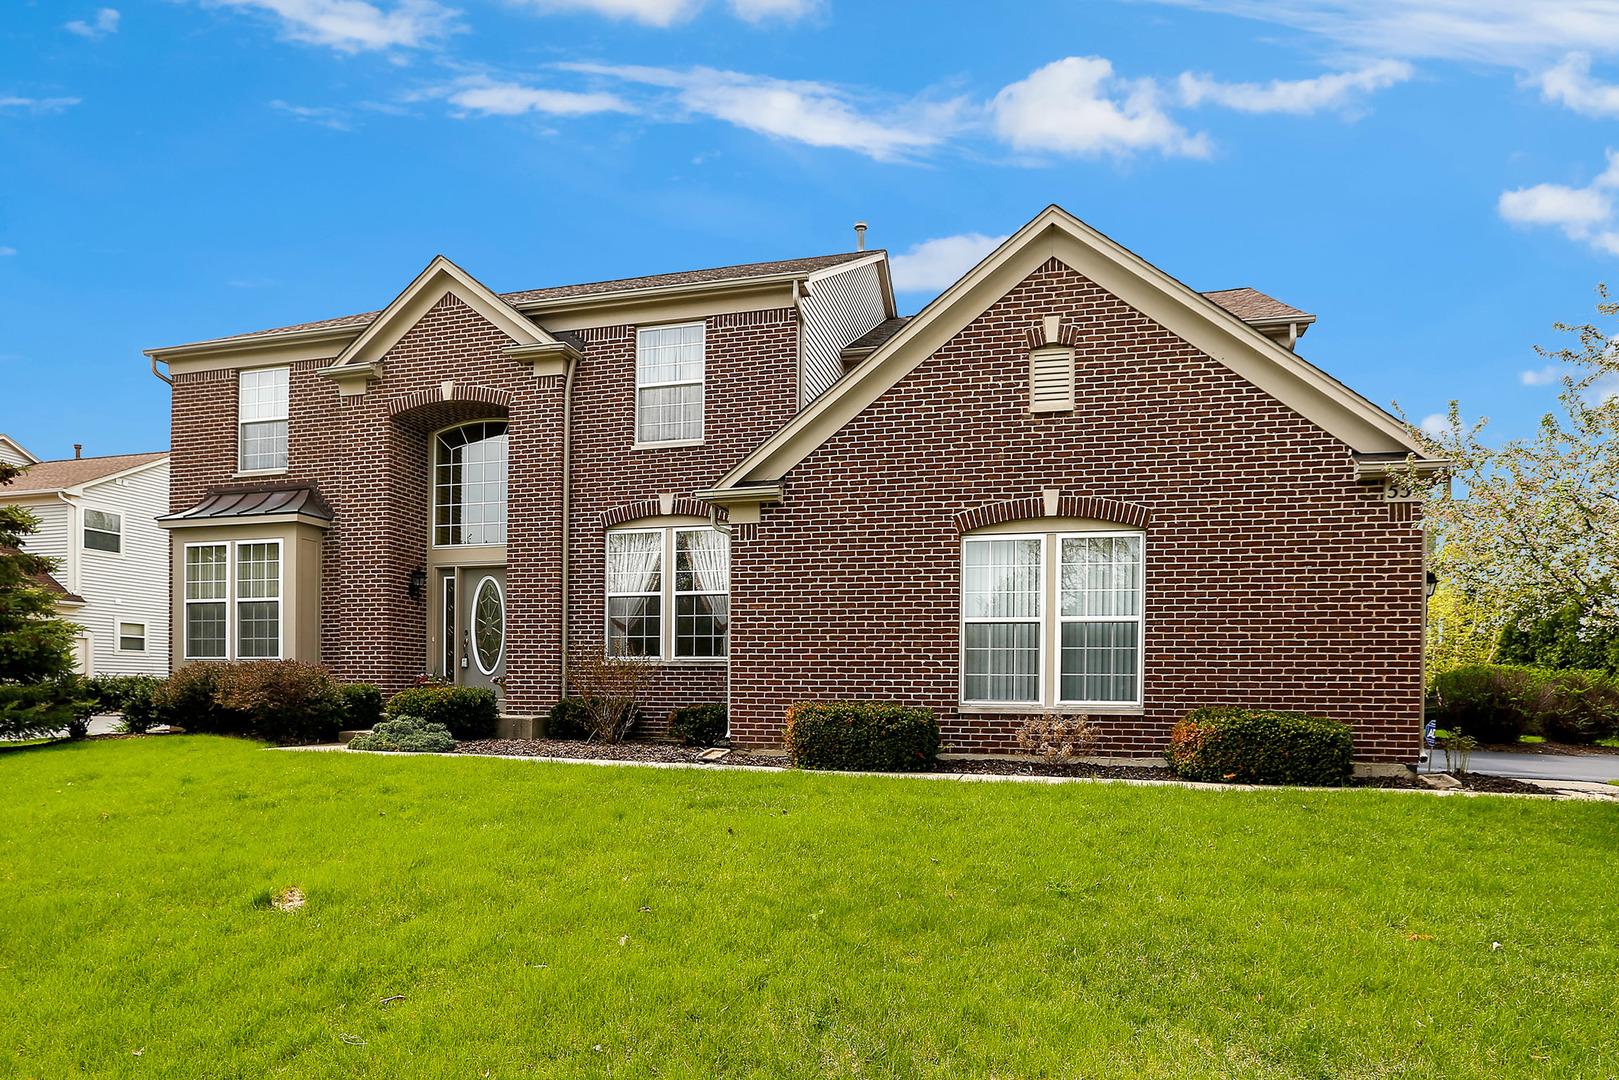 Property for sale at 550 Brookside Avenue, Algonquin,  IL 60102